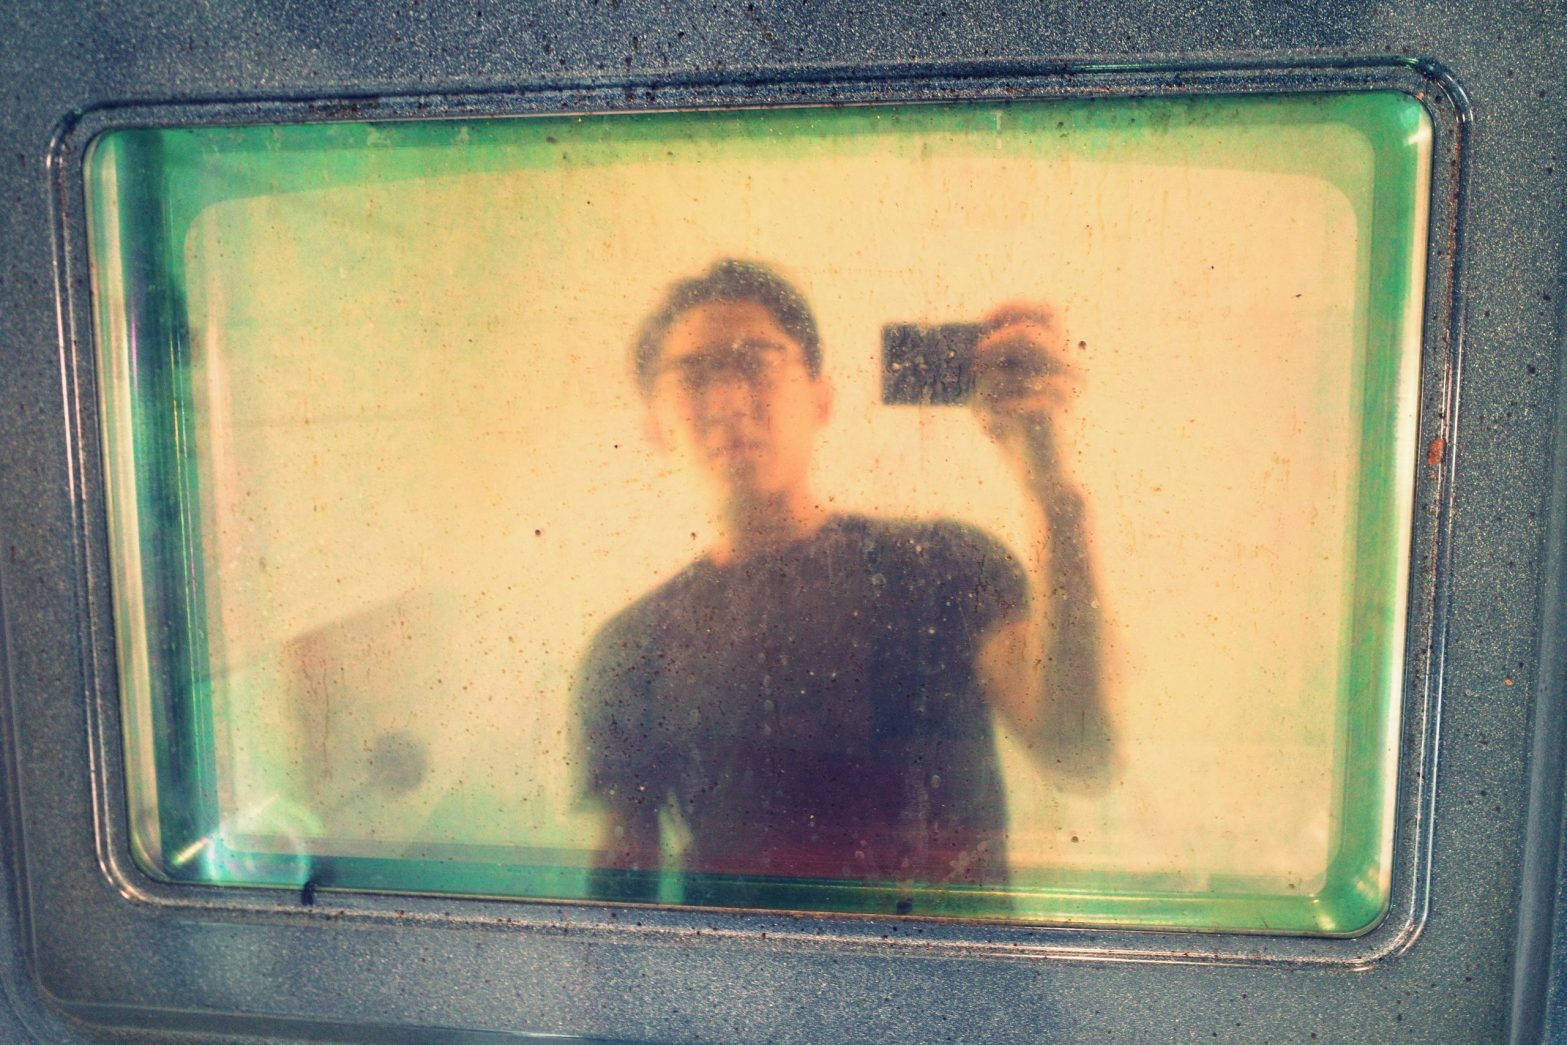 Selfie Ricoh oven pan ERIC KIM